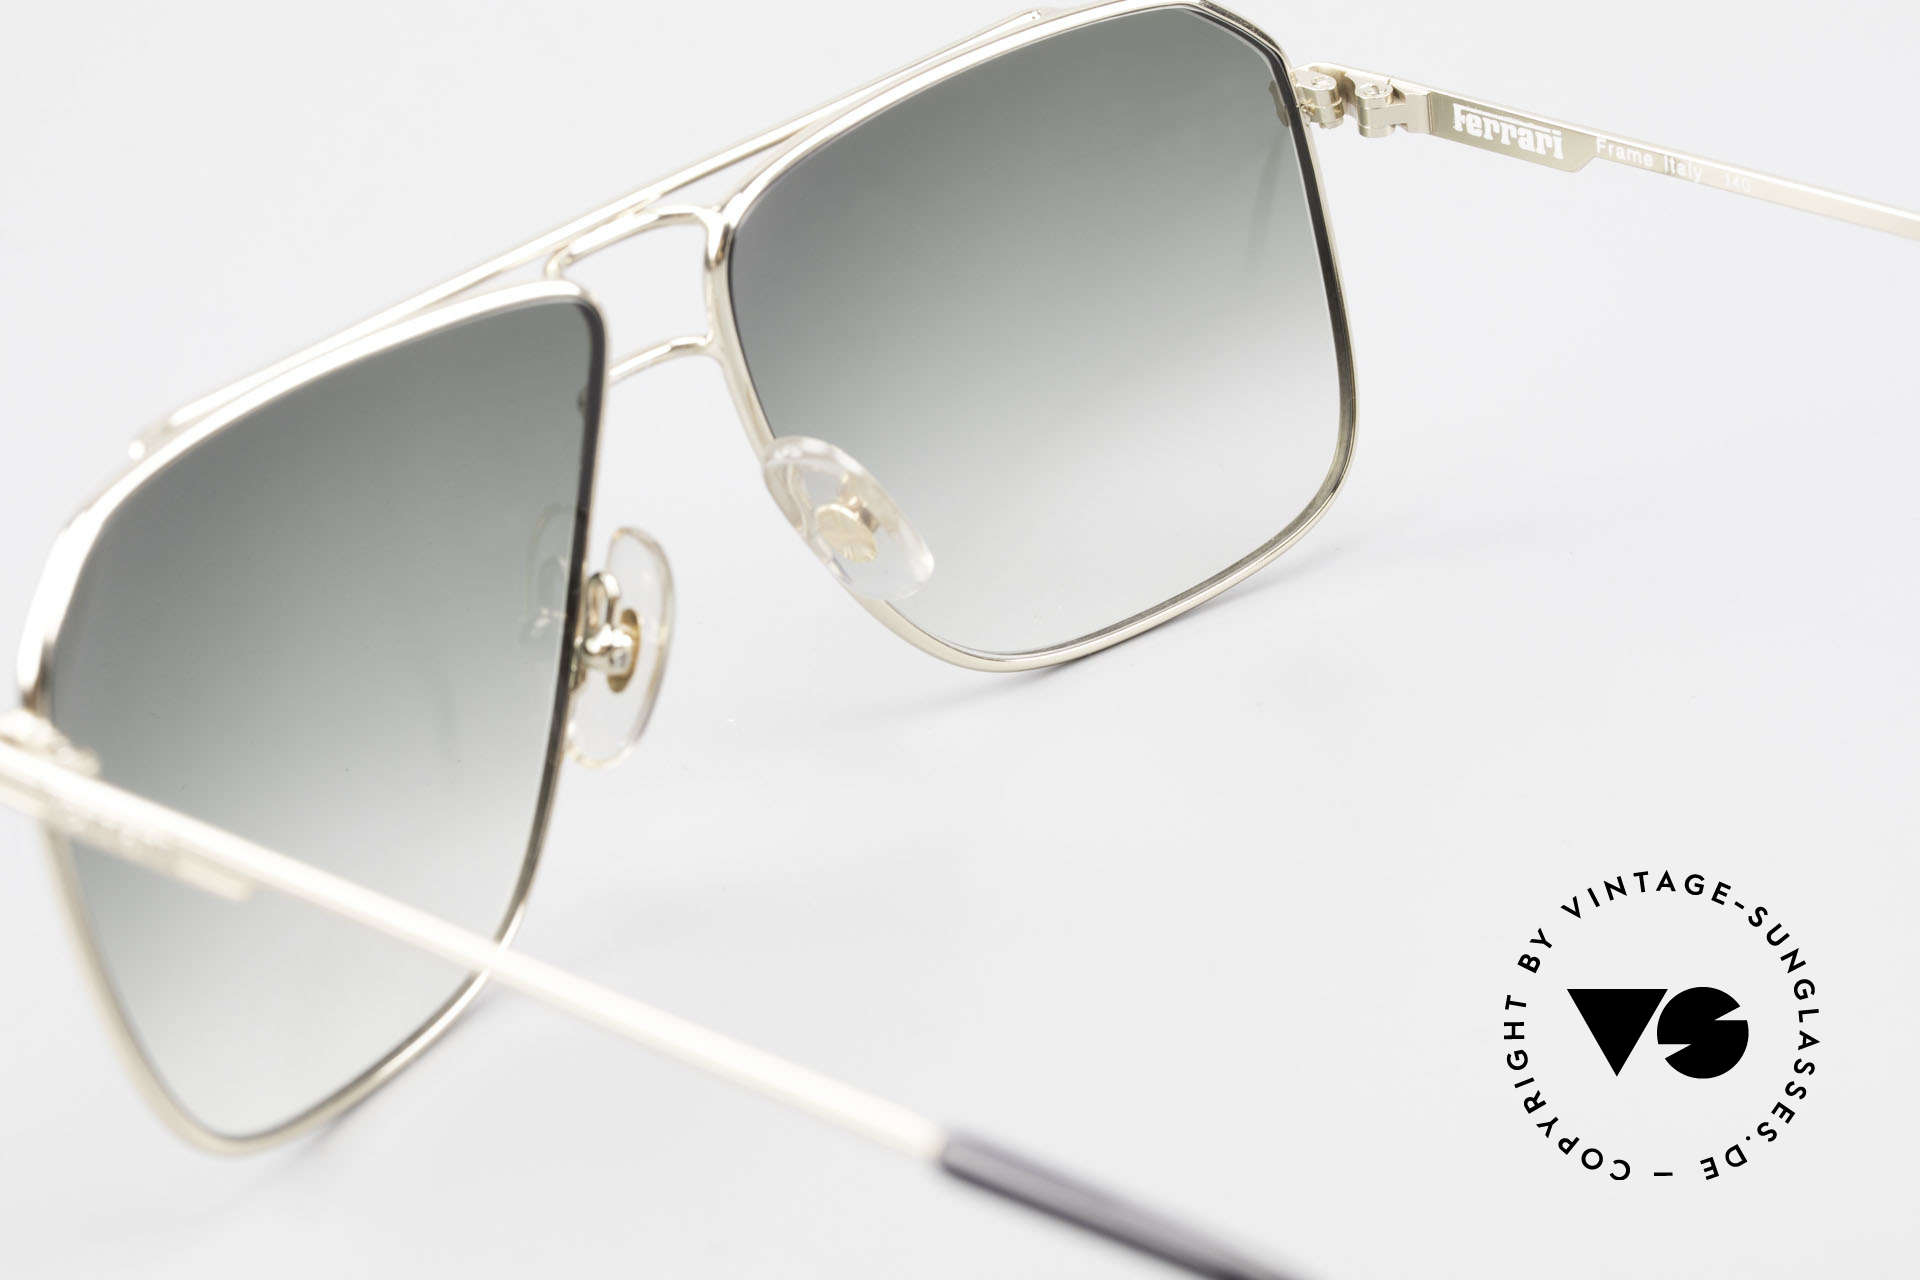 Ferrari F24 Men's Vintage Sunglasses 90's, NO RETRO sunglasses, but a 30 years old ORIGINAL, Made for Men